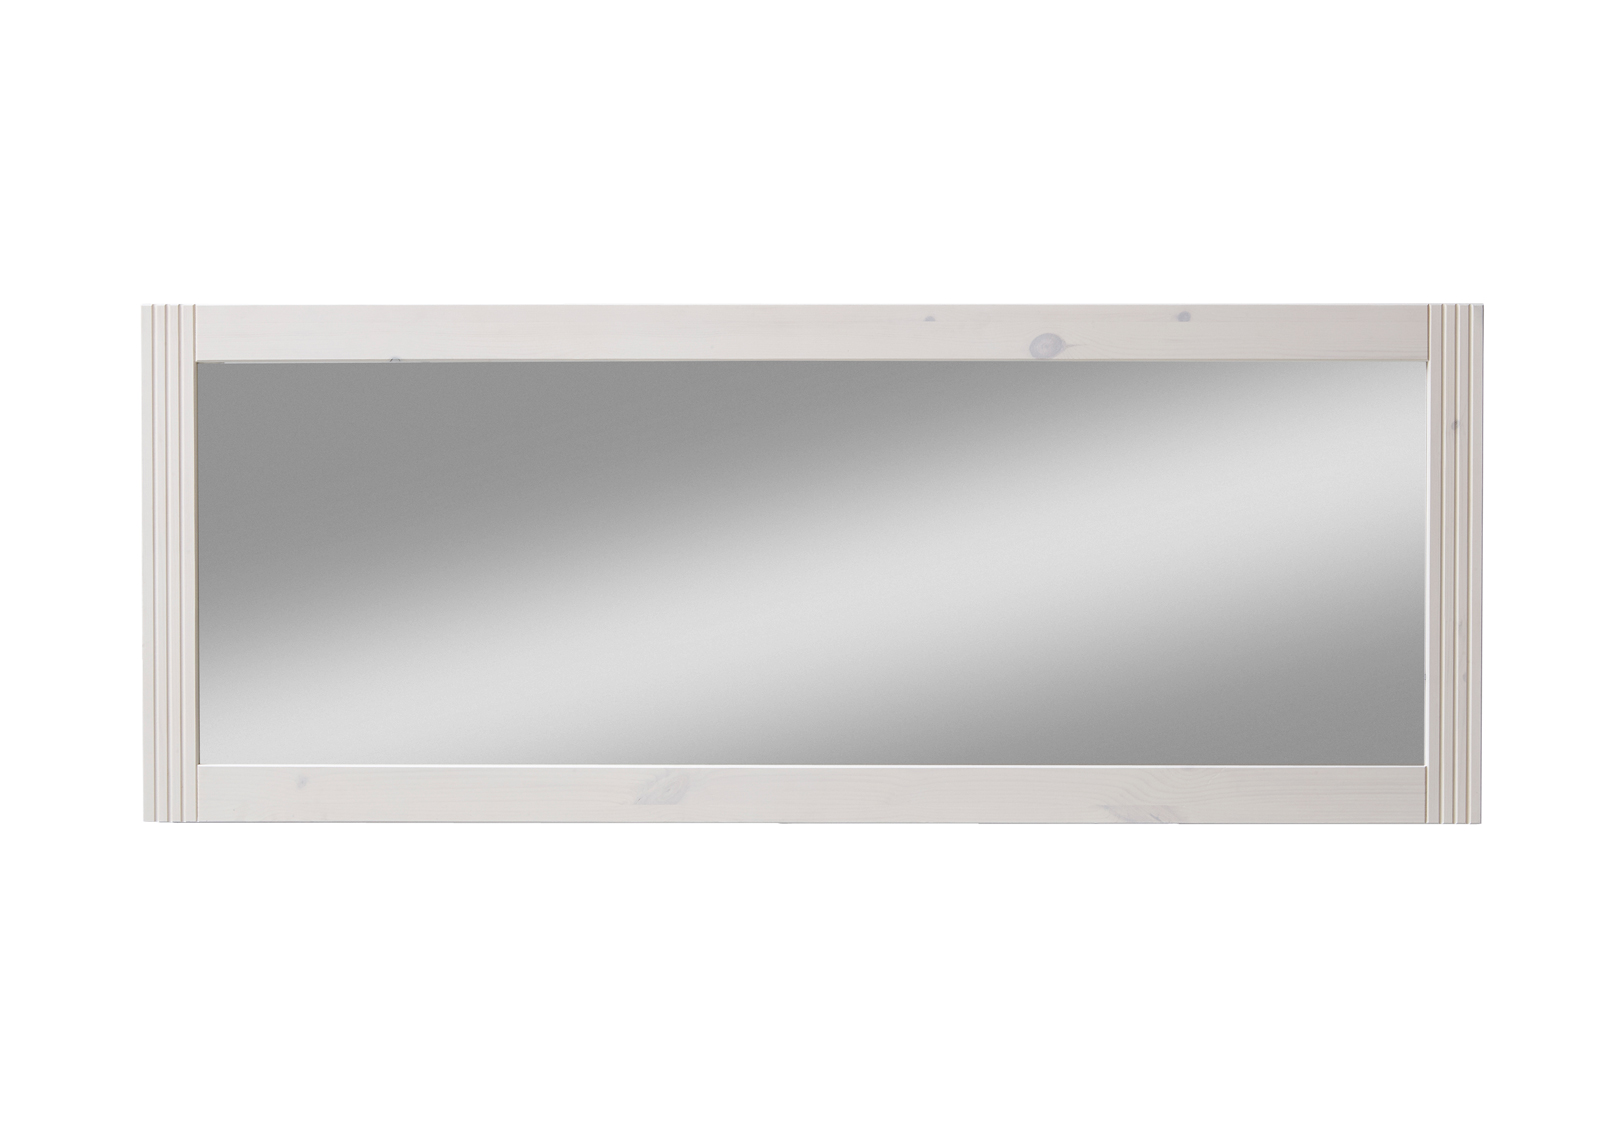 Peili Monaco 677 128x41 cm